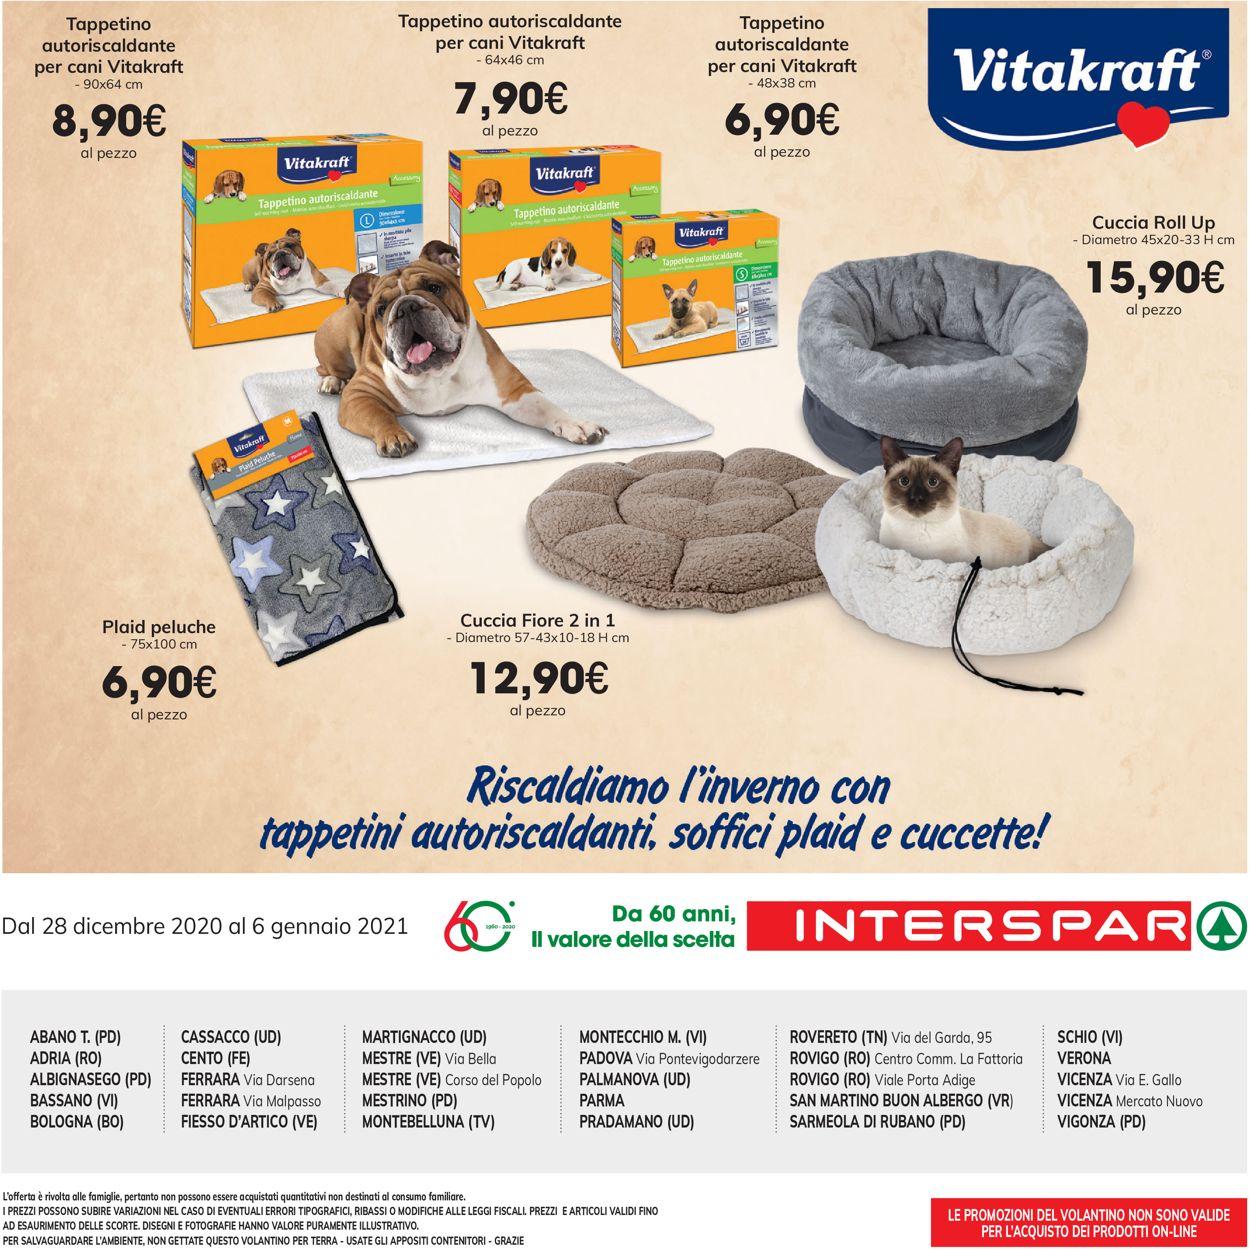 Volantino Eurospar -  Capodanno 2021 - Offerte 28/12-06/01/2021 (Pagina 8)